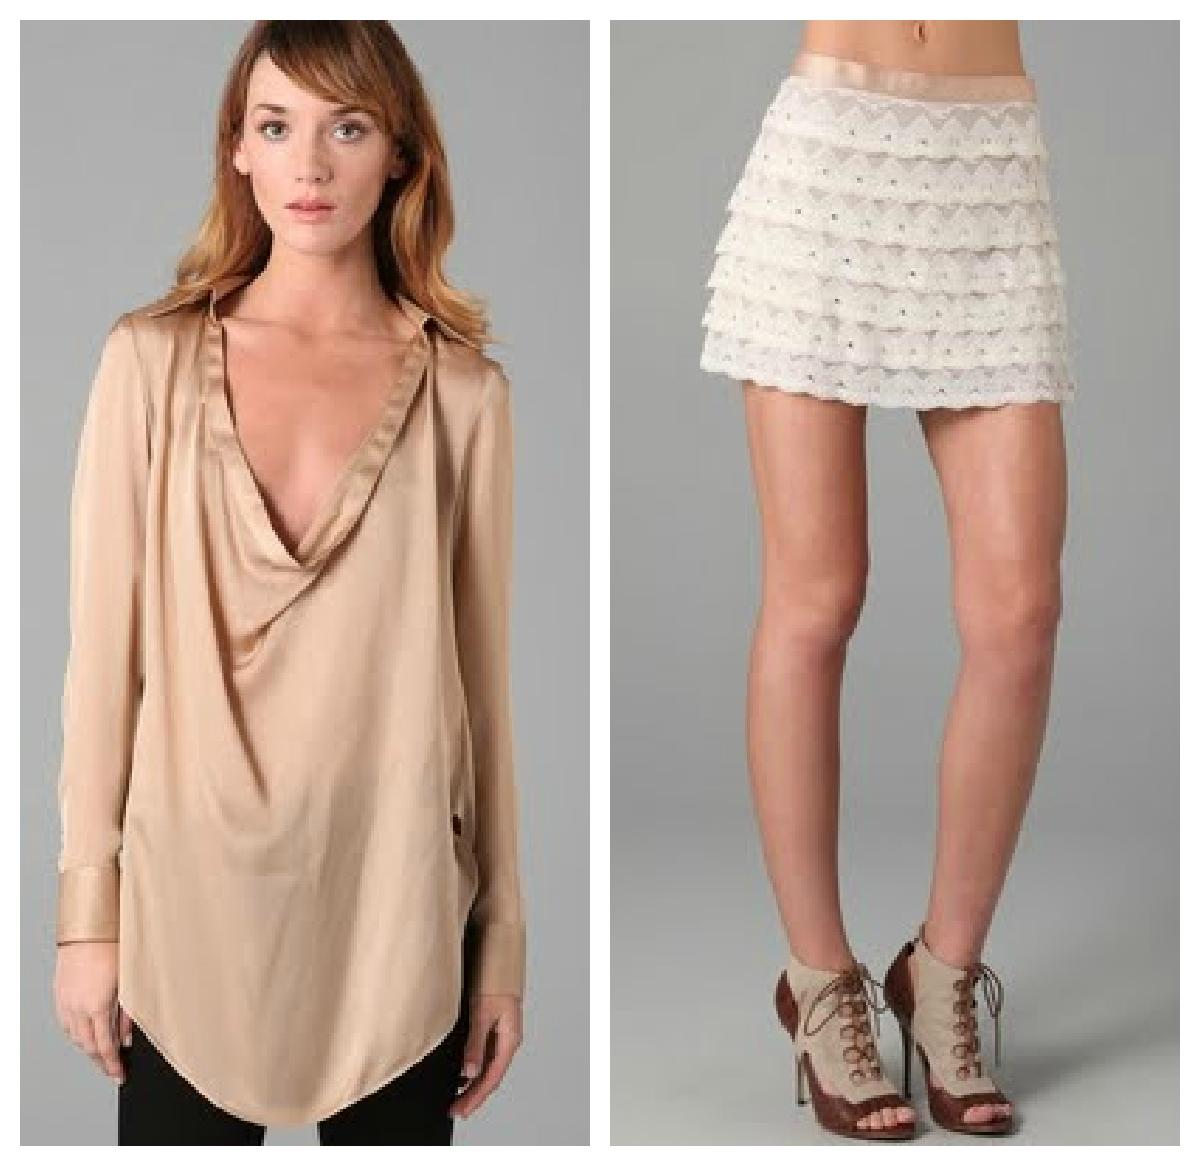 http://4.bp.blogspot.com/-yjmfUqkgOC0/T-J870WMskI/AAAAAAAADVs/rhEWBPsGfxA/s1600/emily+maynard+style+jessica+simpson+nude+pumps+emily+maynard+haute+hippie+silk+blouse+skirt+lace+tierd.jpg